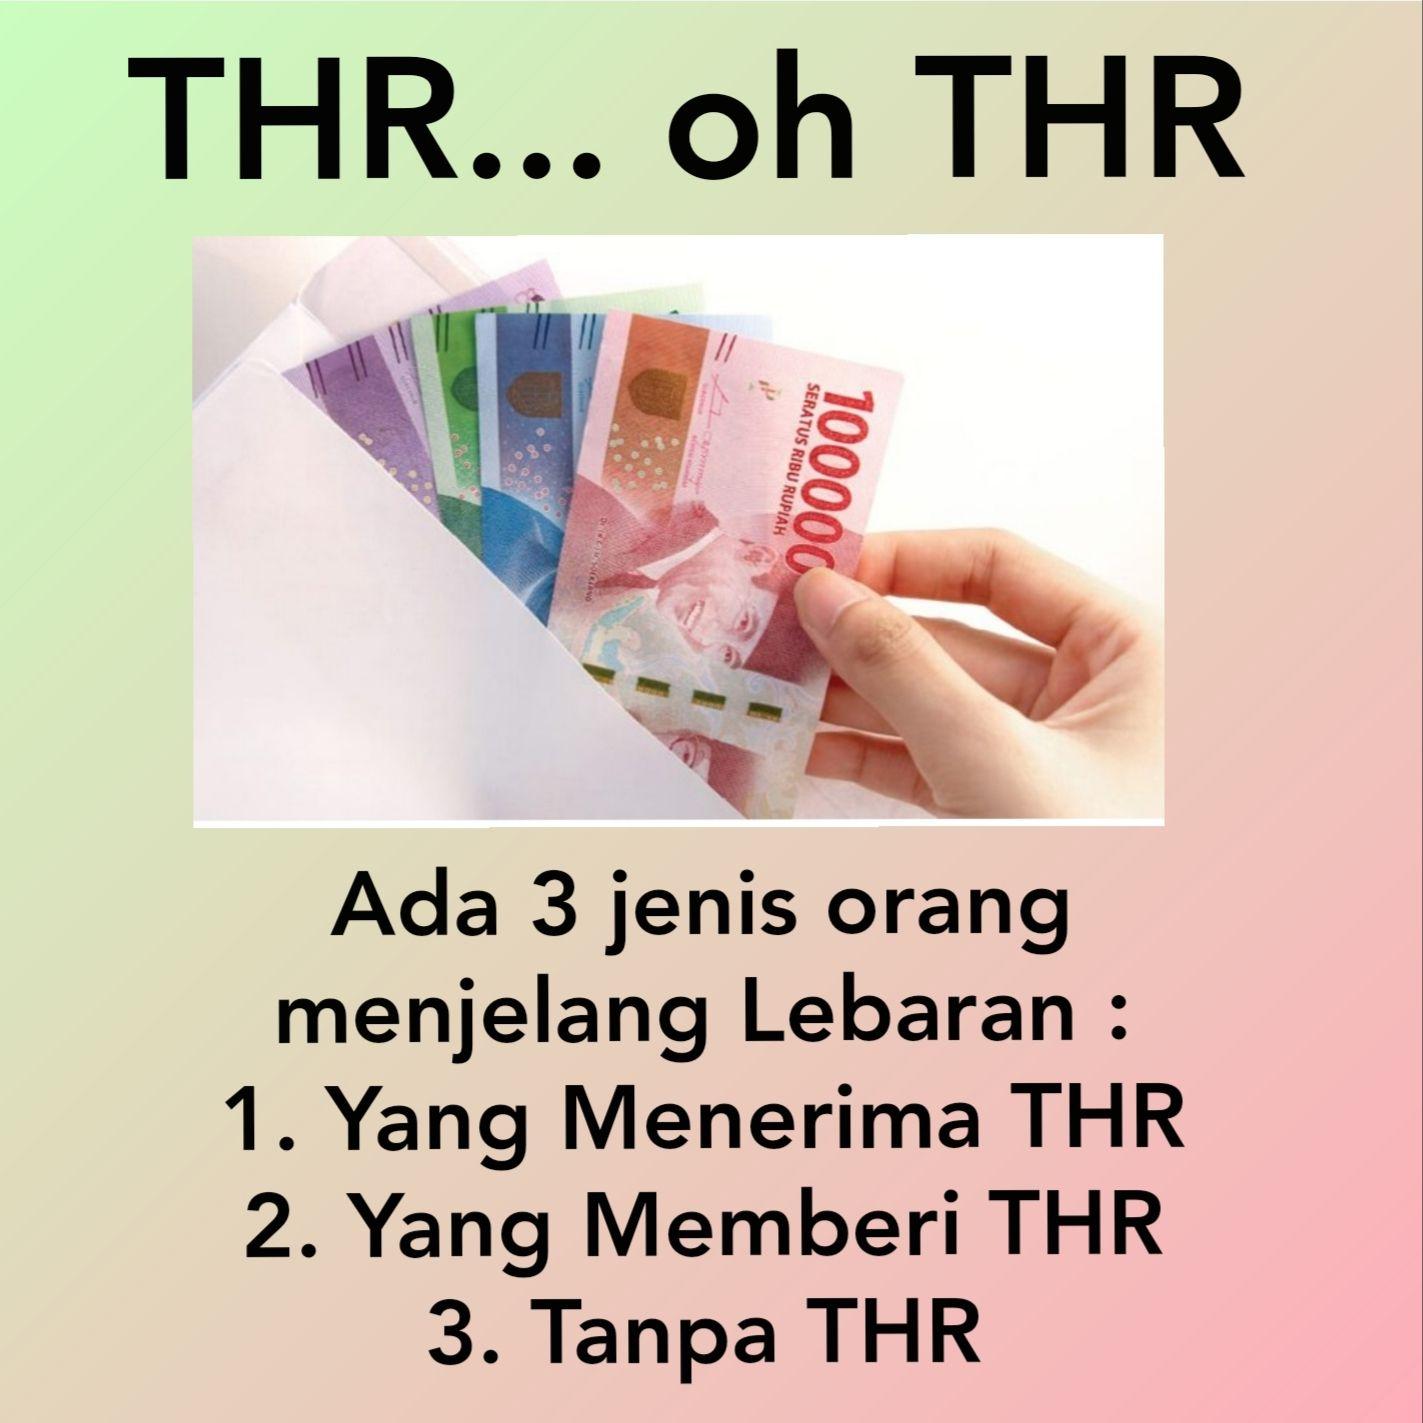 THR Oh THR